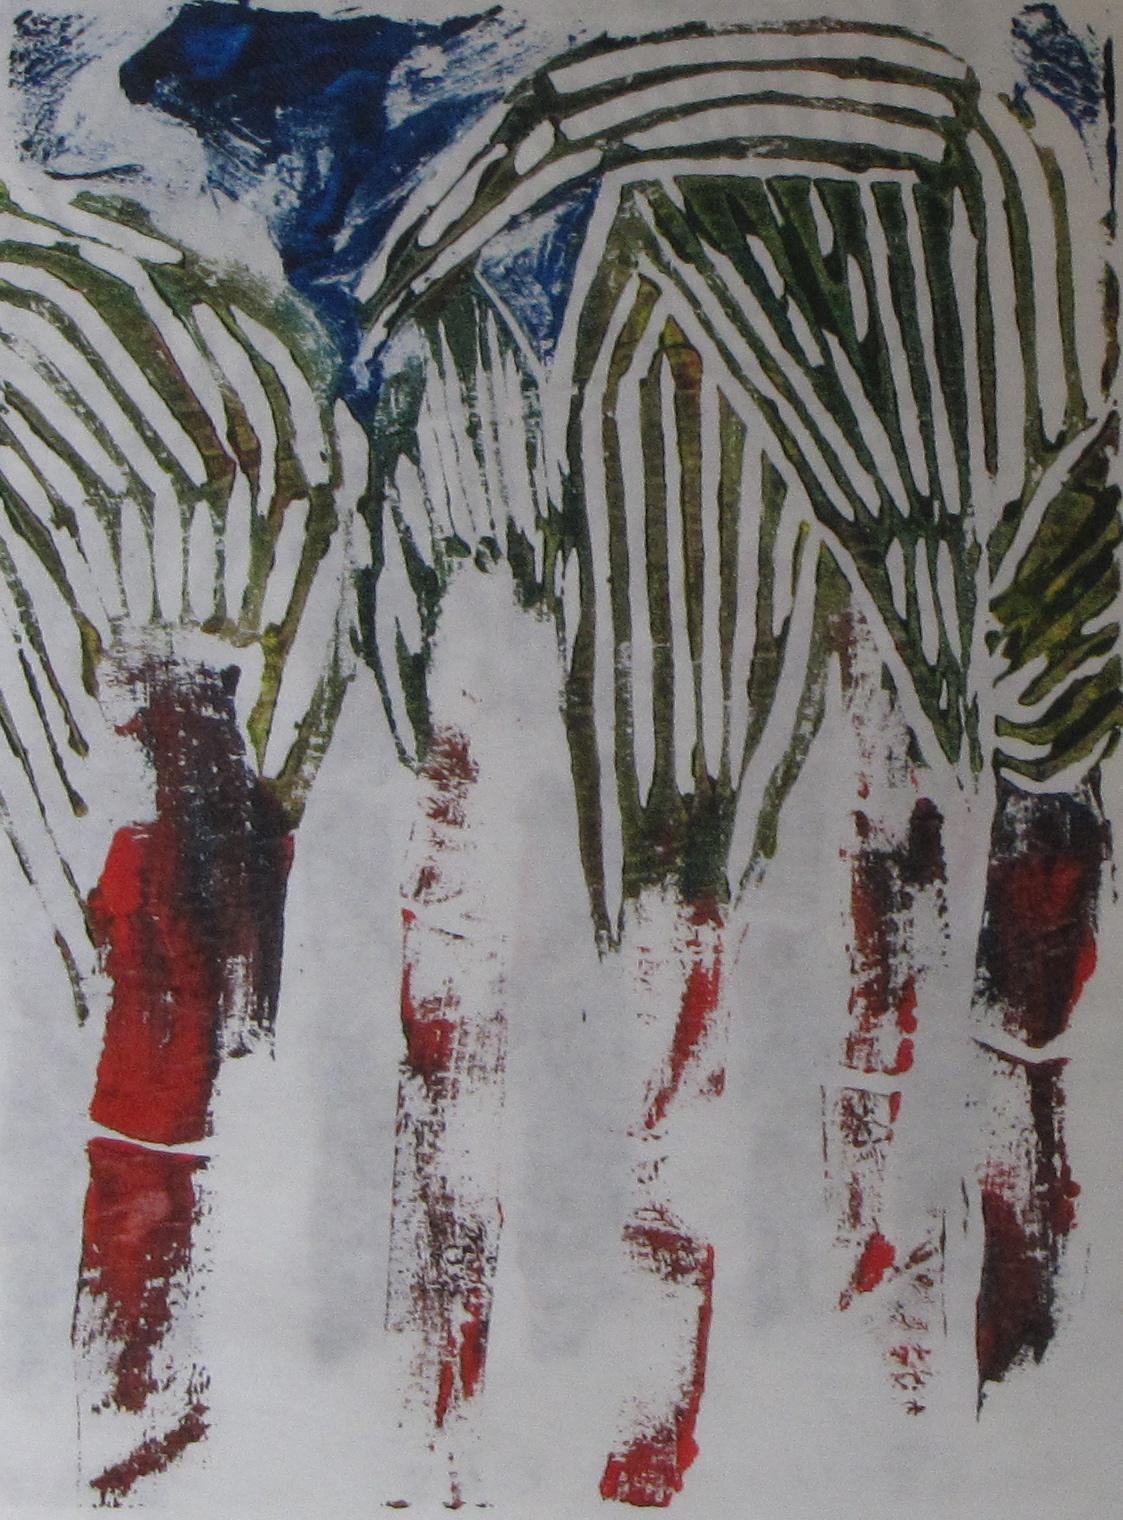 Ghost Corn, 1 of 3, Russell Steven Powell linoprint, 6x8